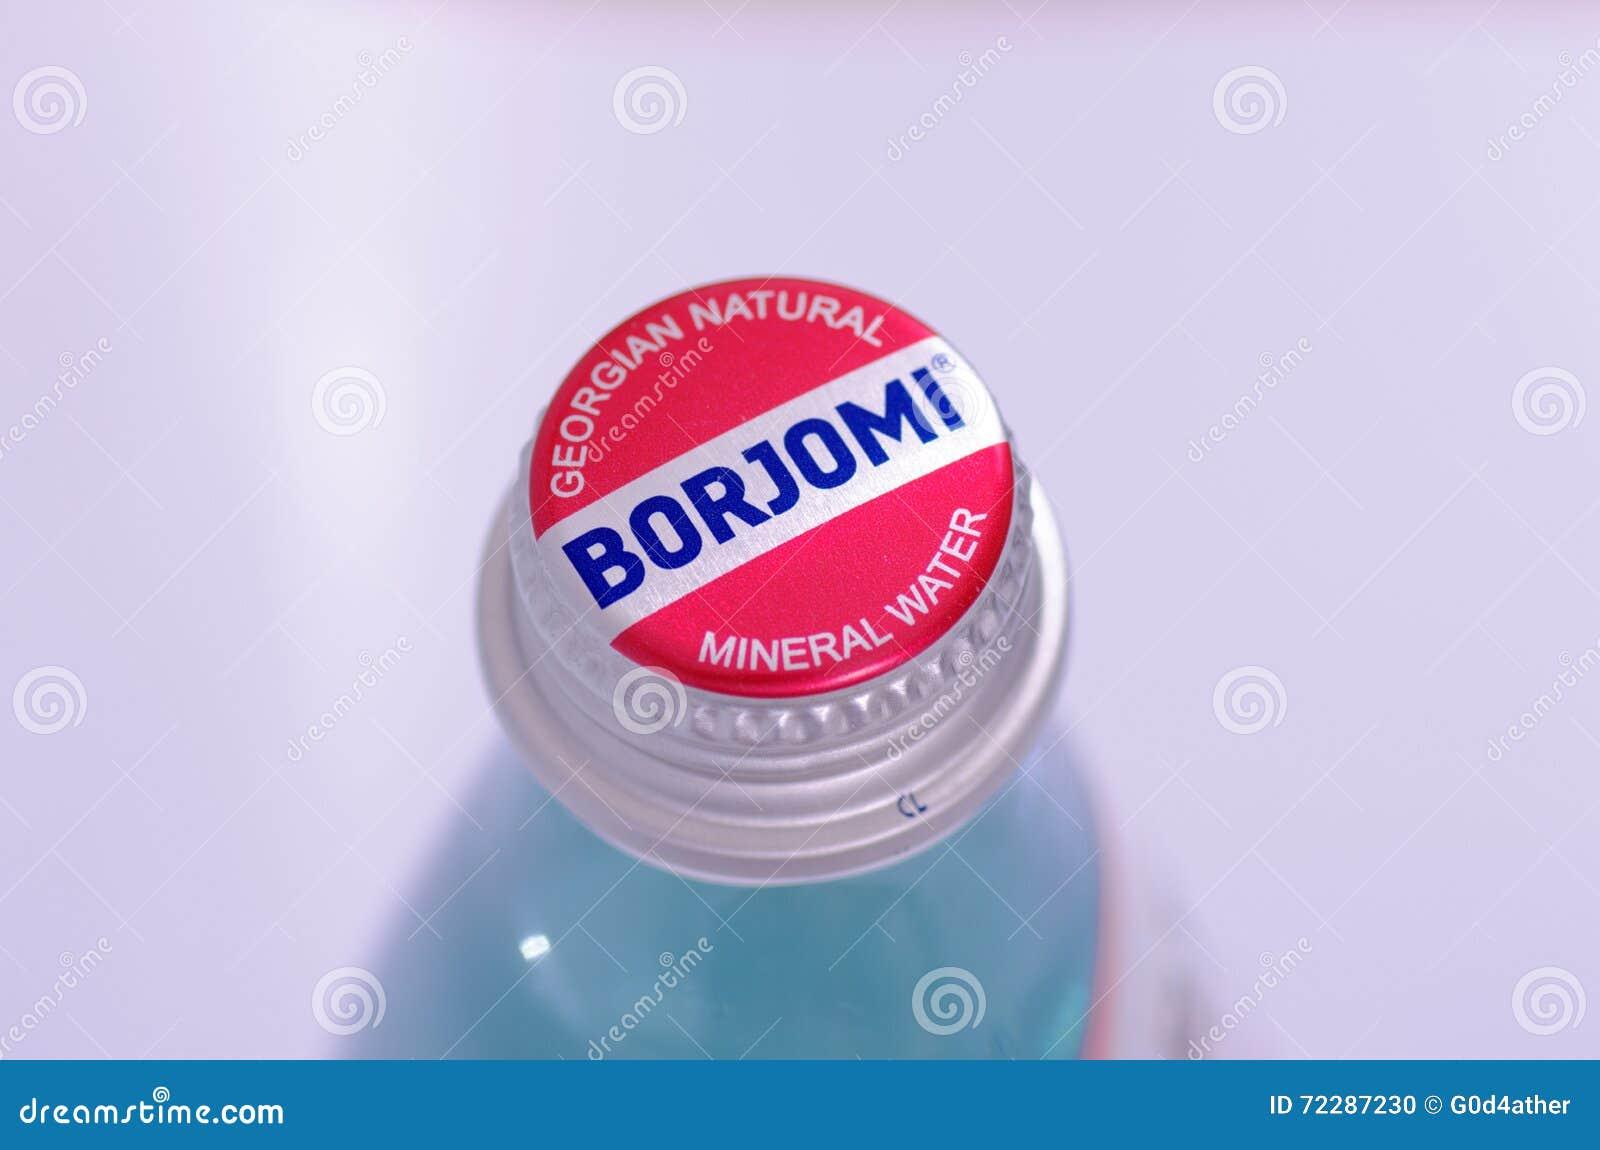 Download Borjomi редакционное изображение. изображение насчитывающей средств - 72287230